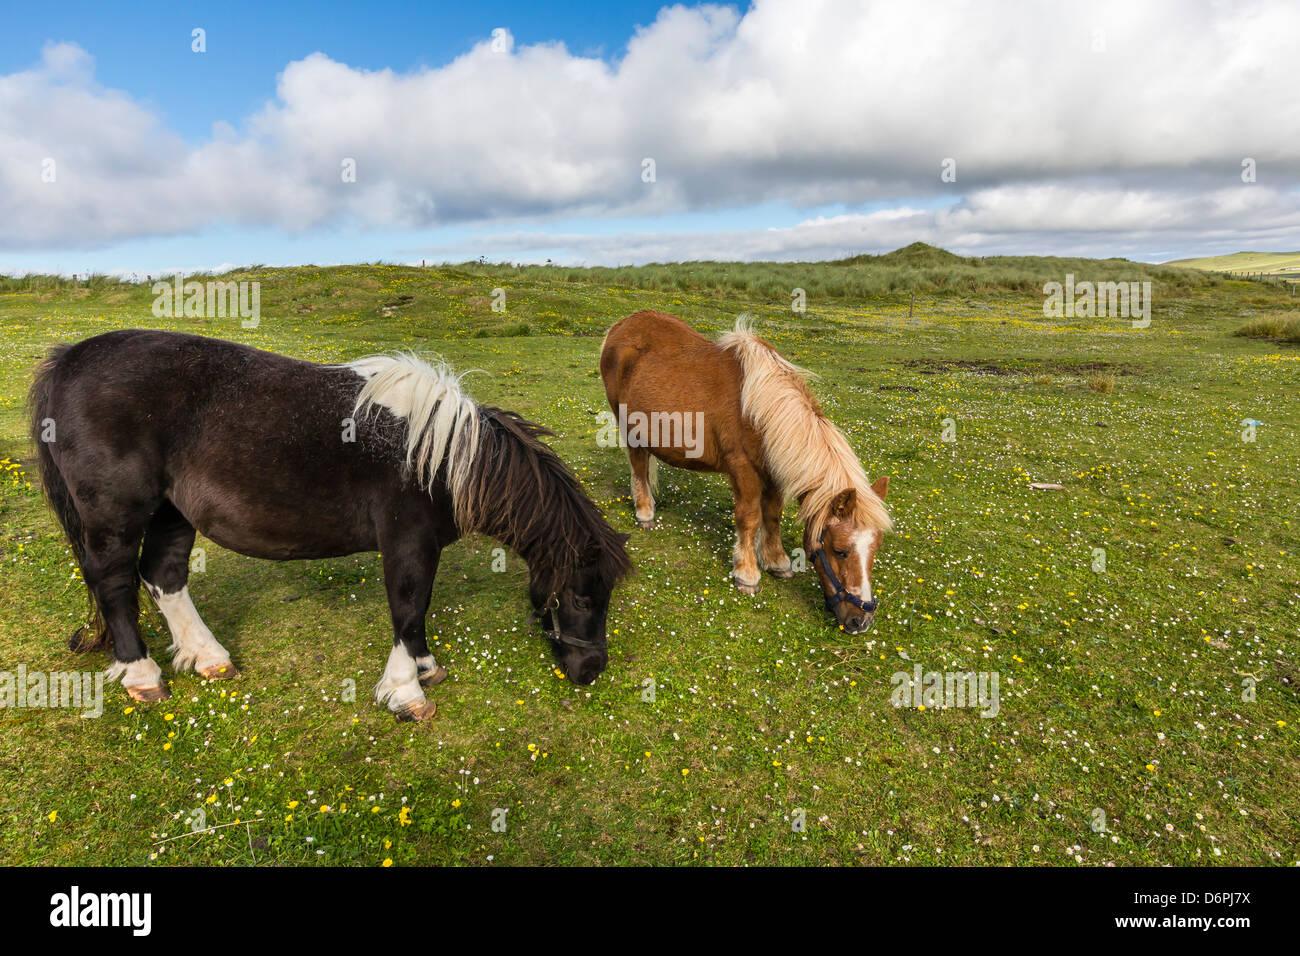 Shetland ponies, Jarlshof, Shetland Isles, Scotland, United Kingdom, Europe - Stock Image